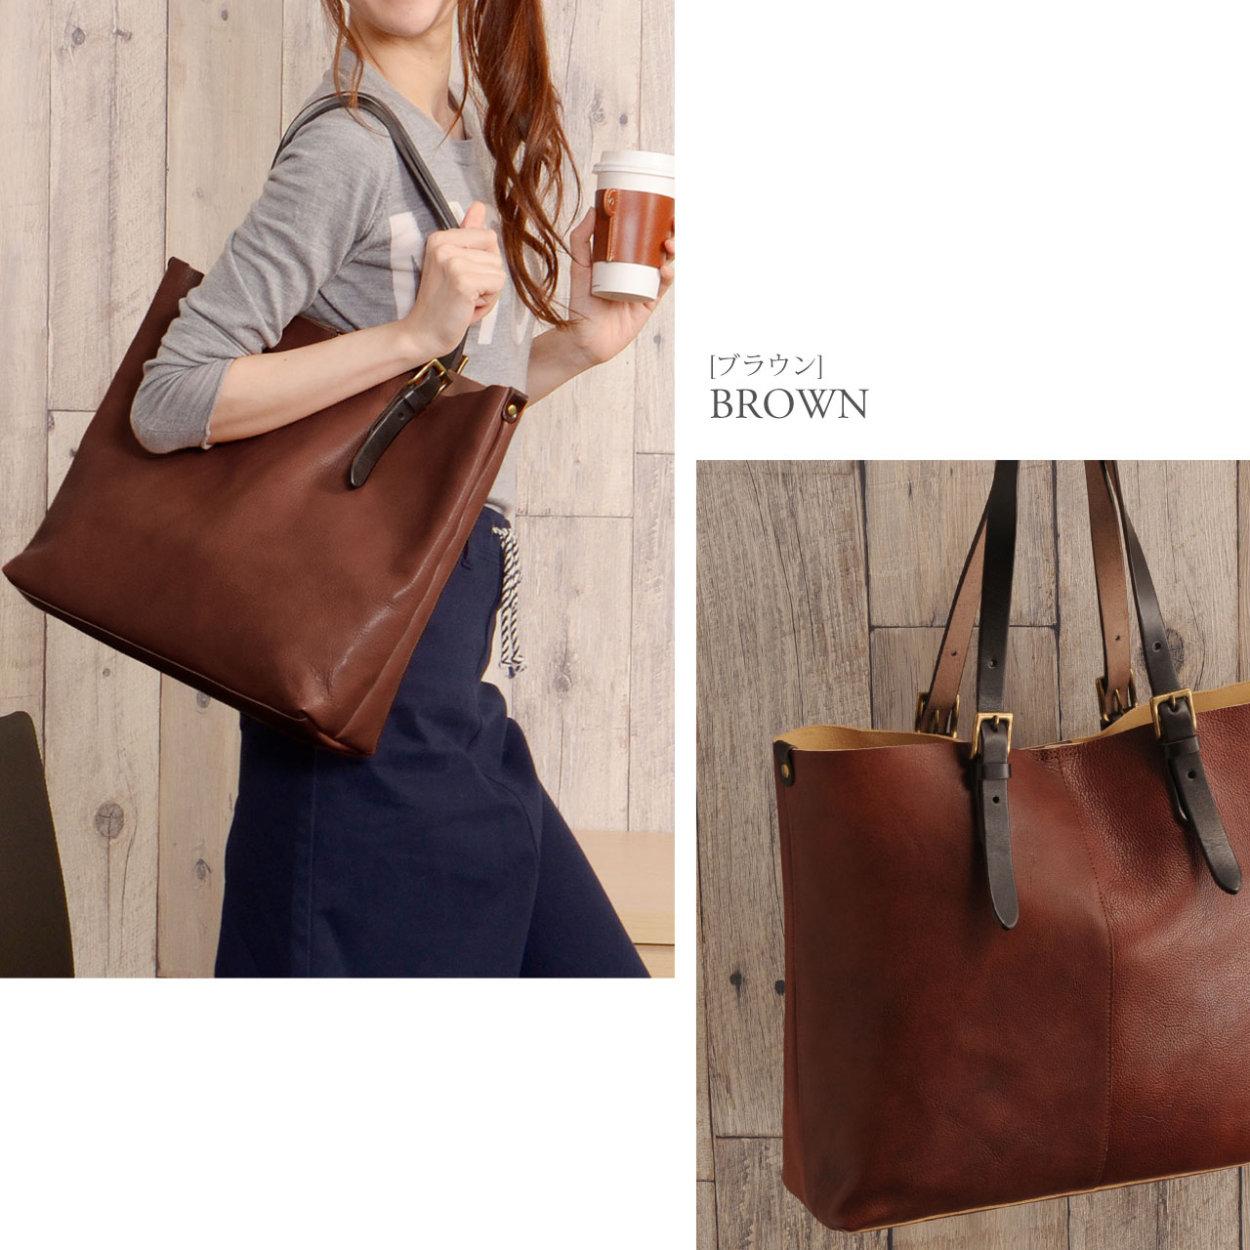 [HALEINE] 牛革 バッグ 切りっぱなし ブラウン キャメル